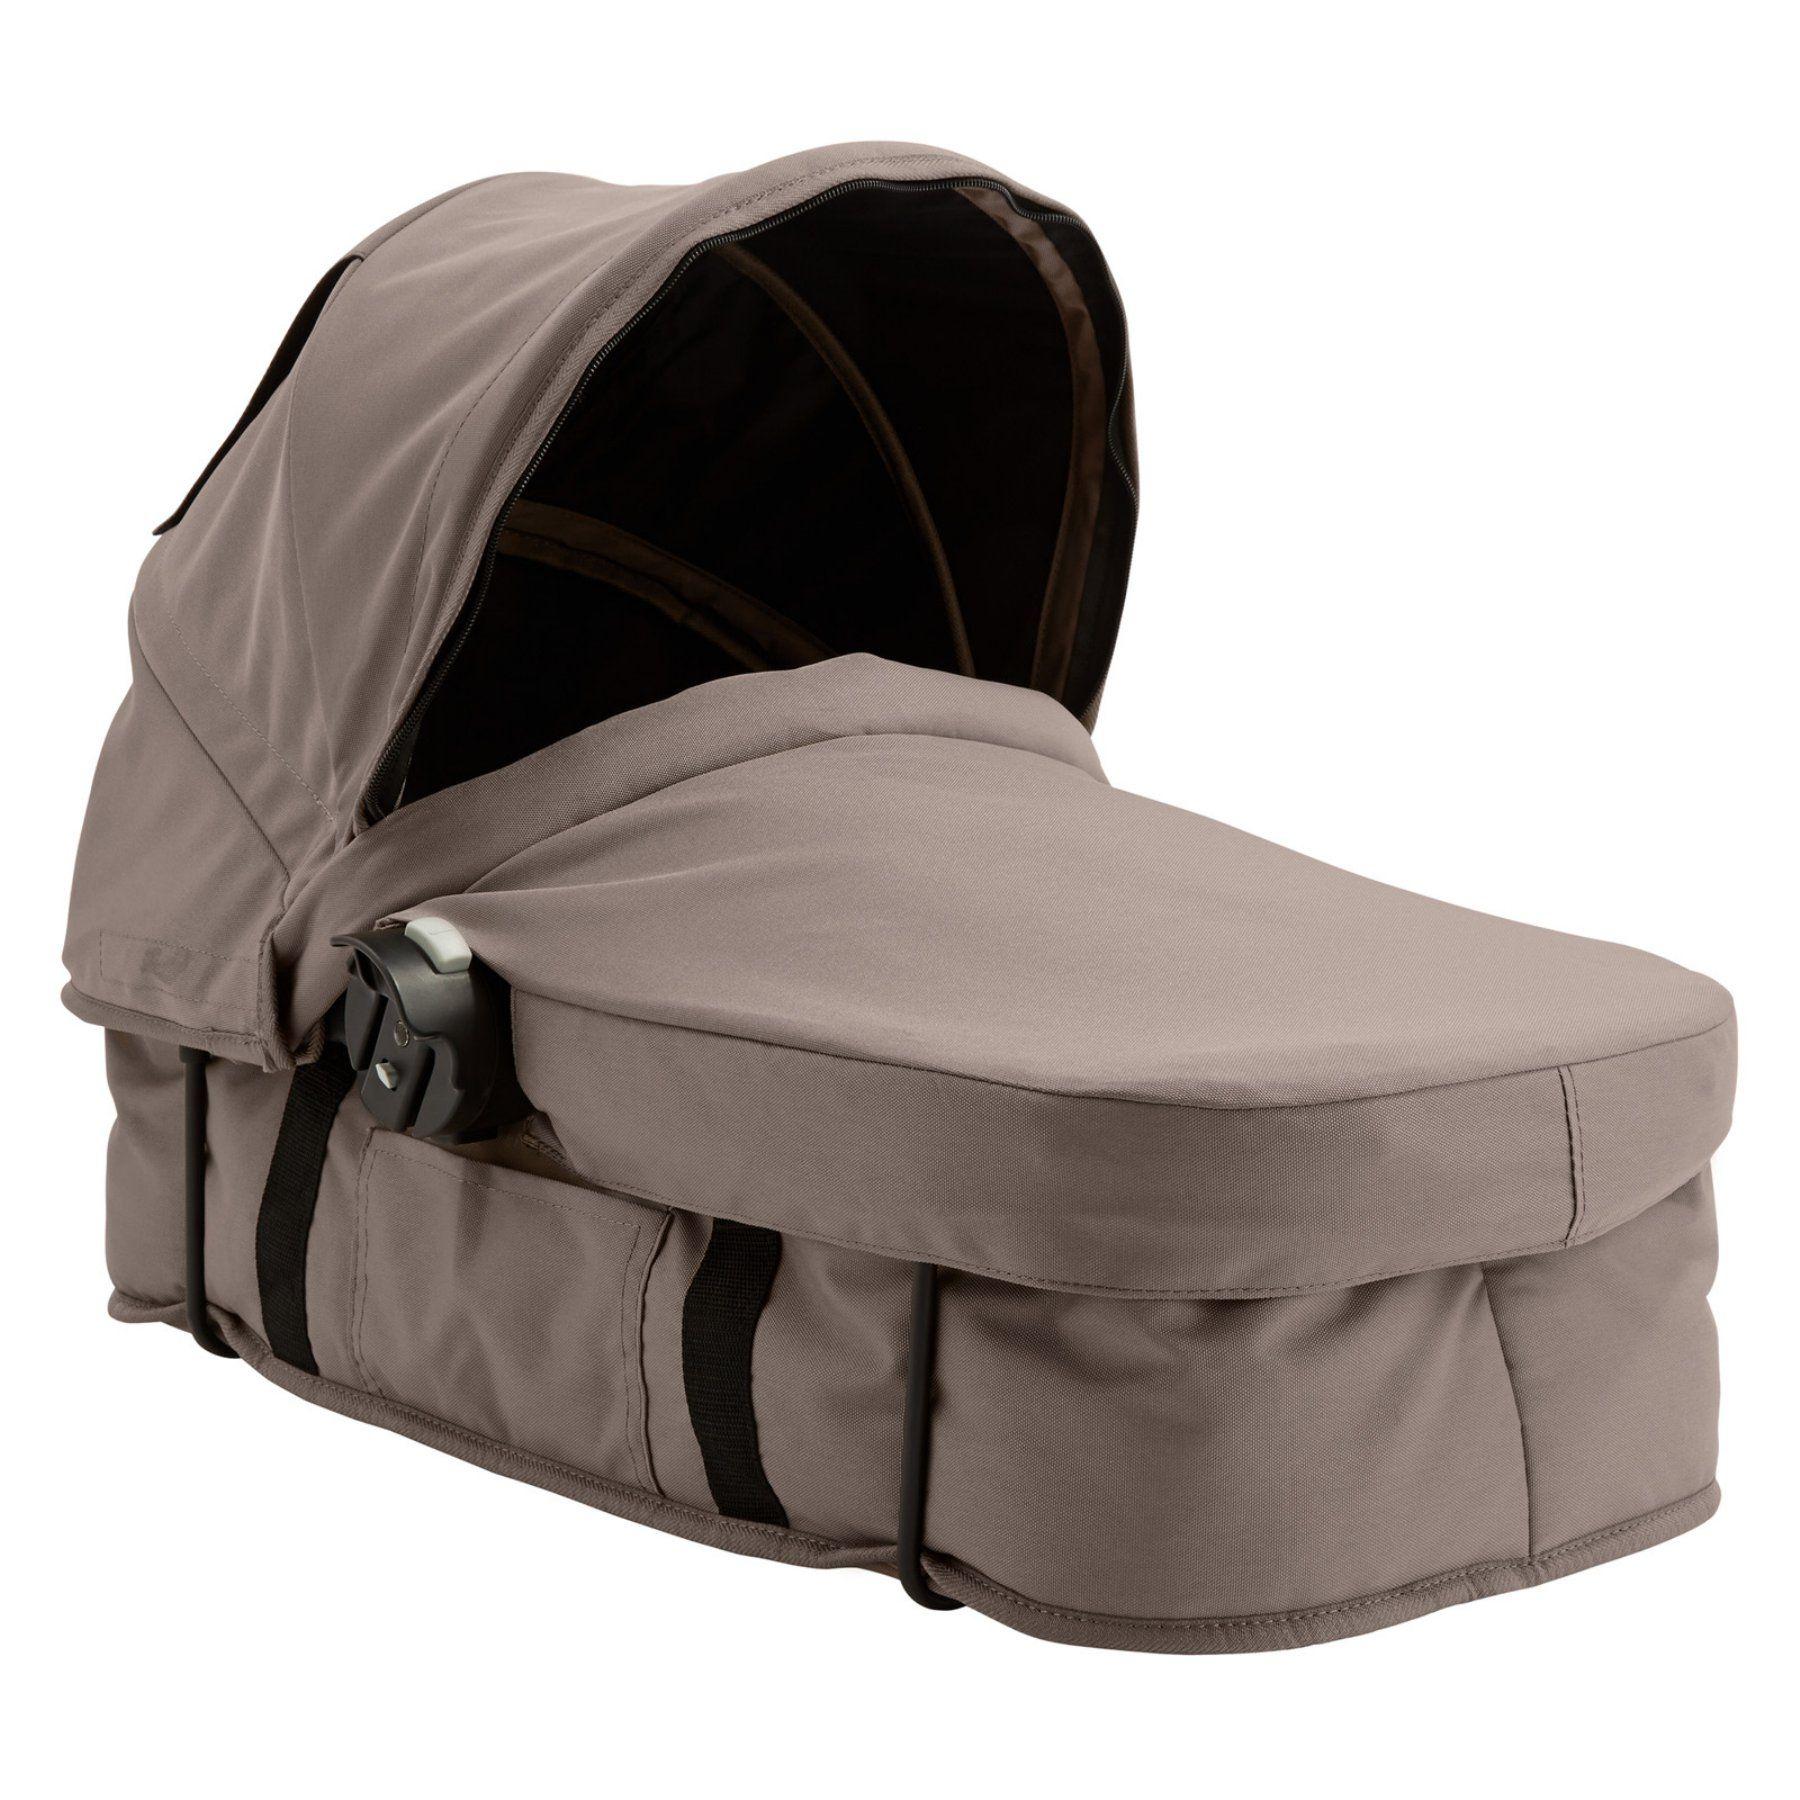 Baby Jogger City Select Stroller Kit Quartz